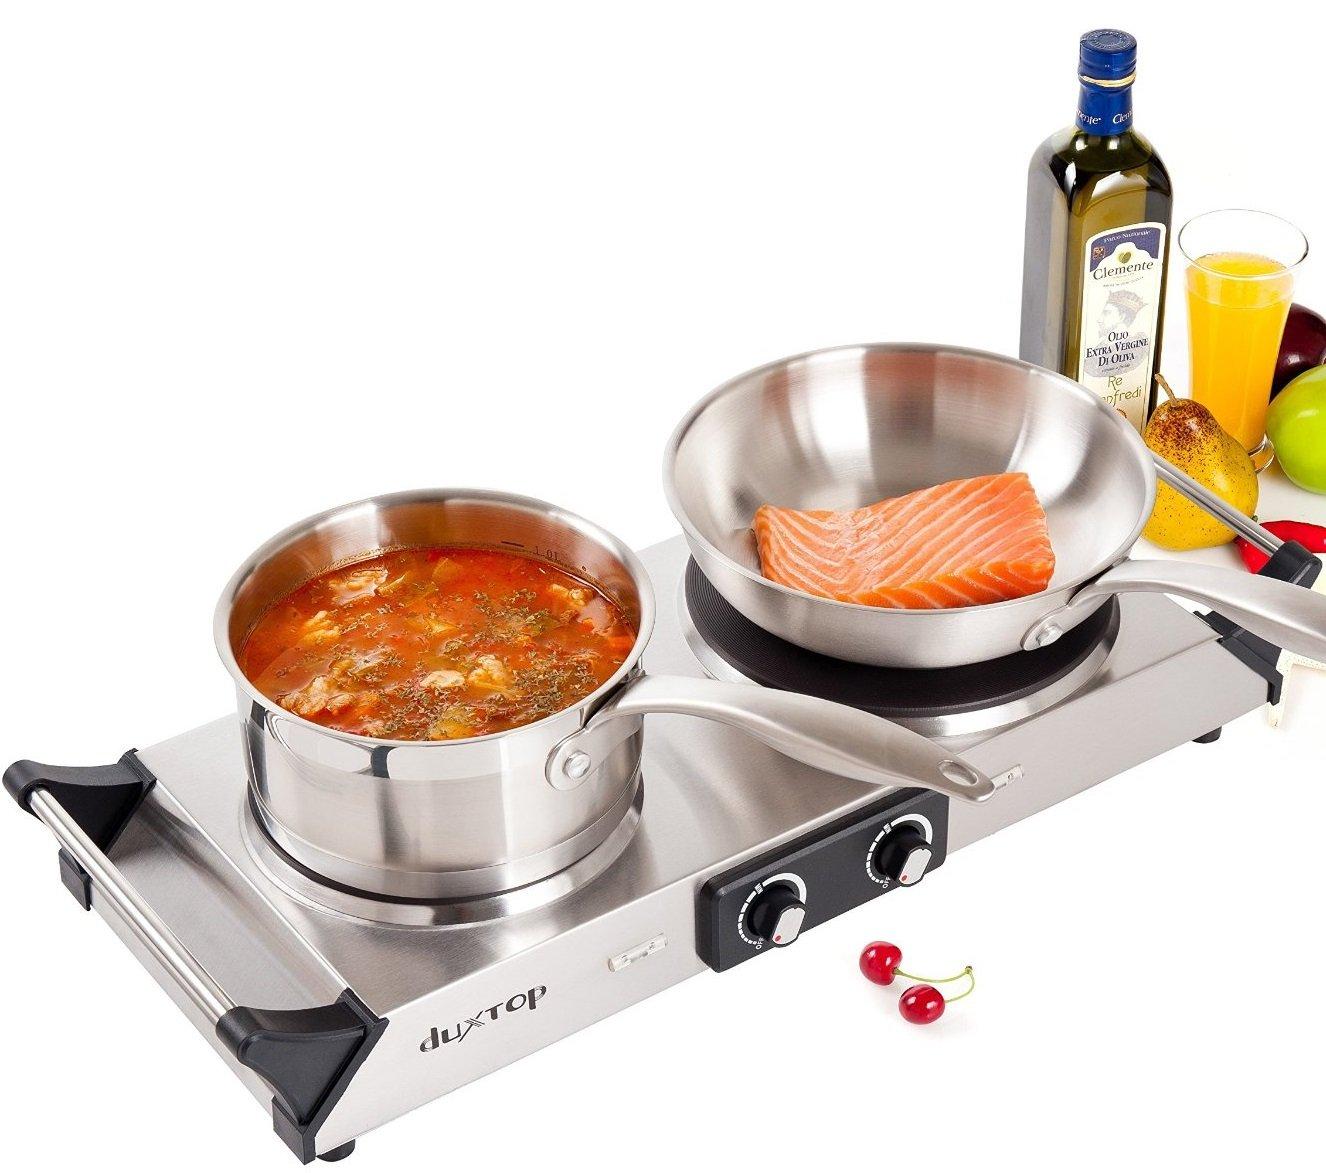 Countertop Burner Target : ... Double Burner Stainless Steel Iron Plate Countertop Cookware eBay